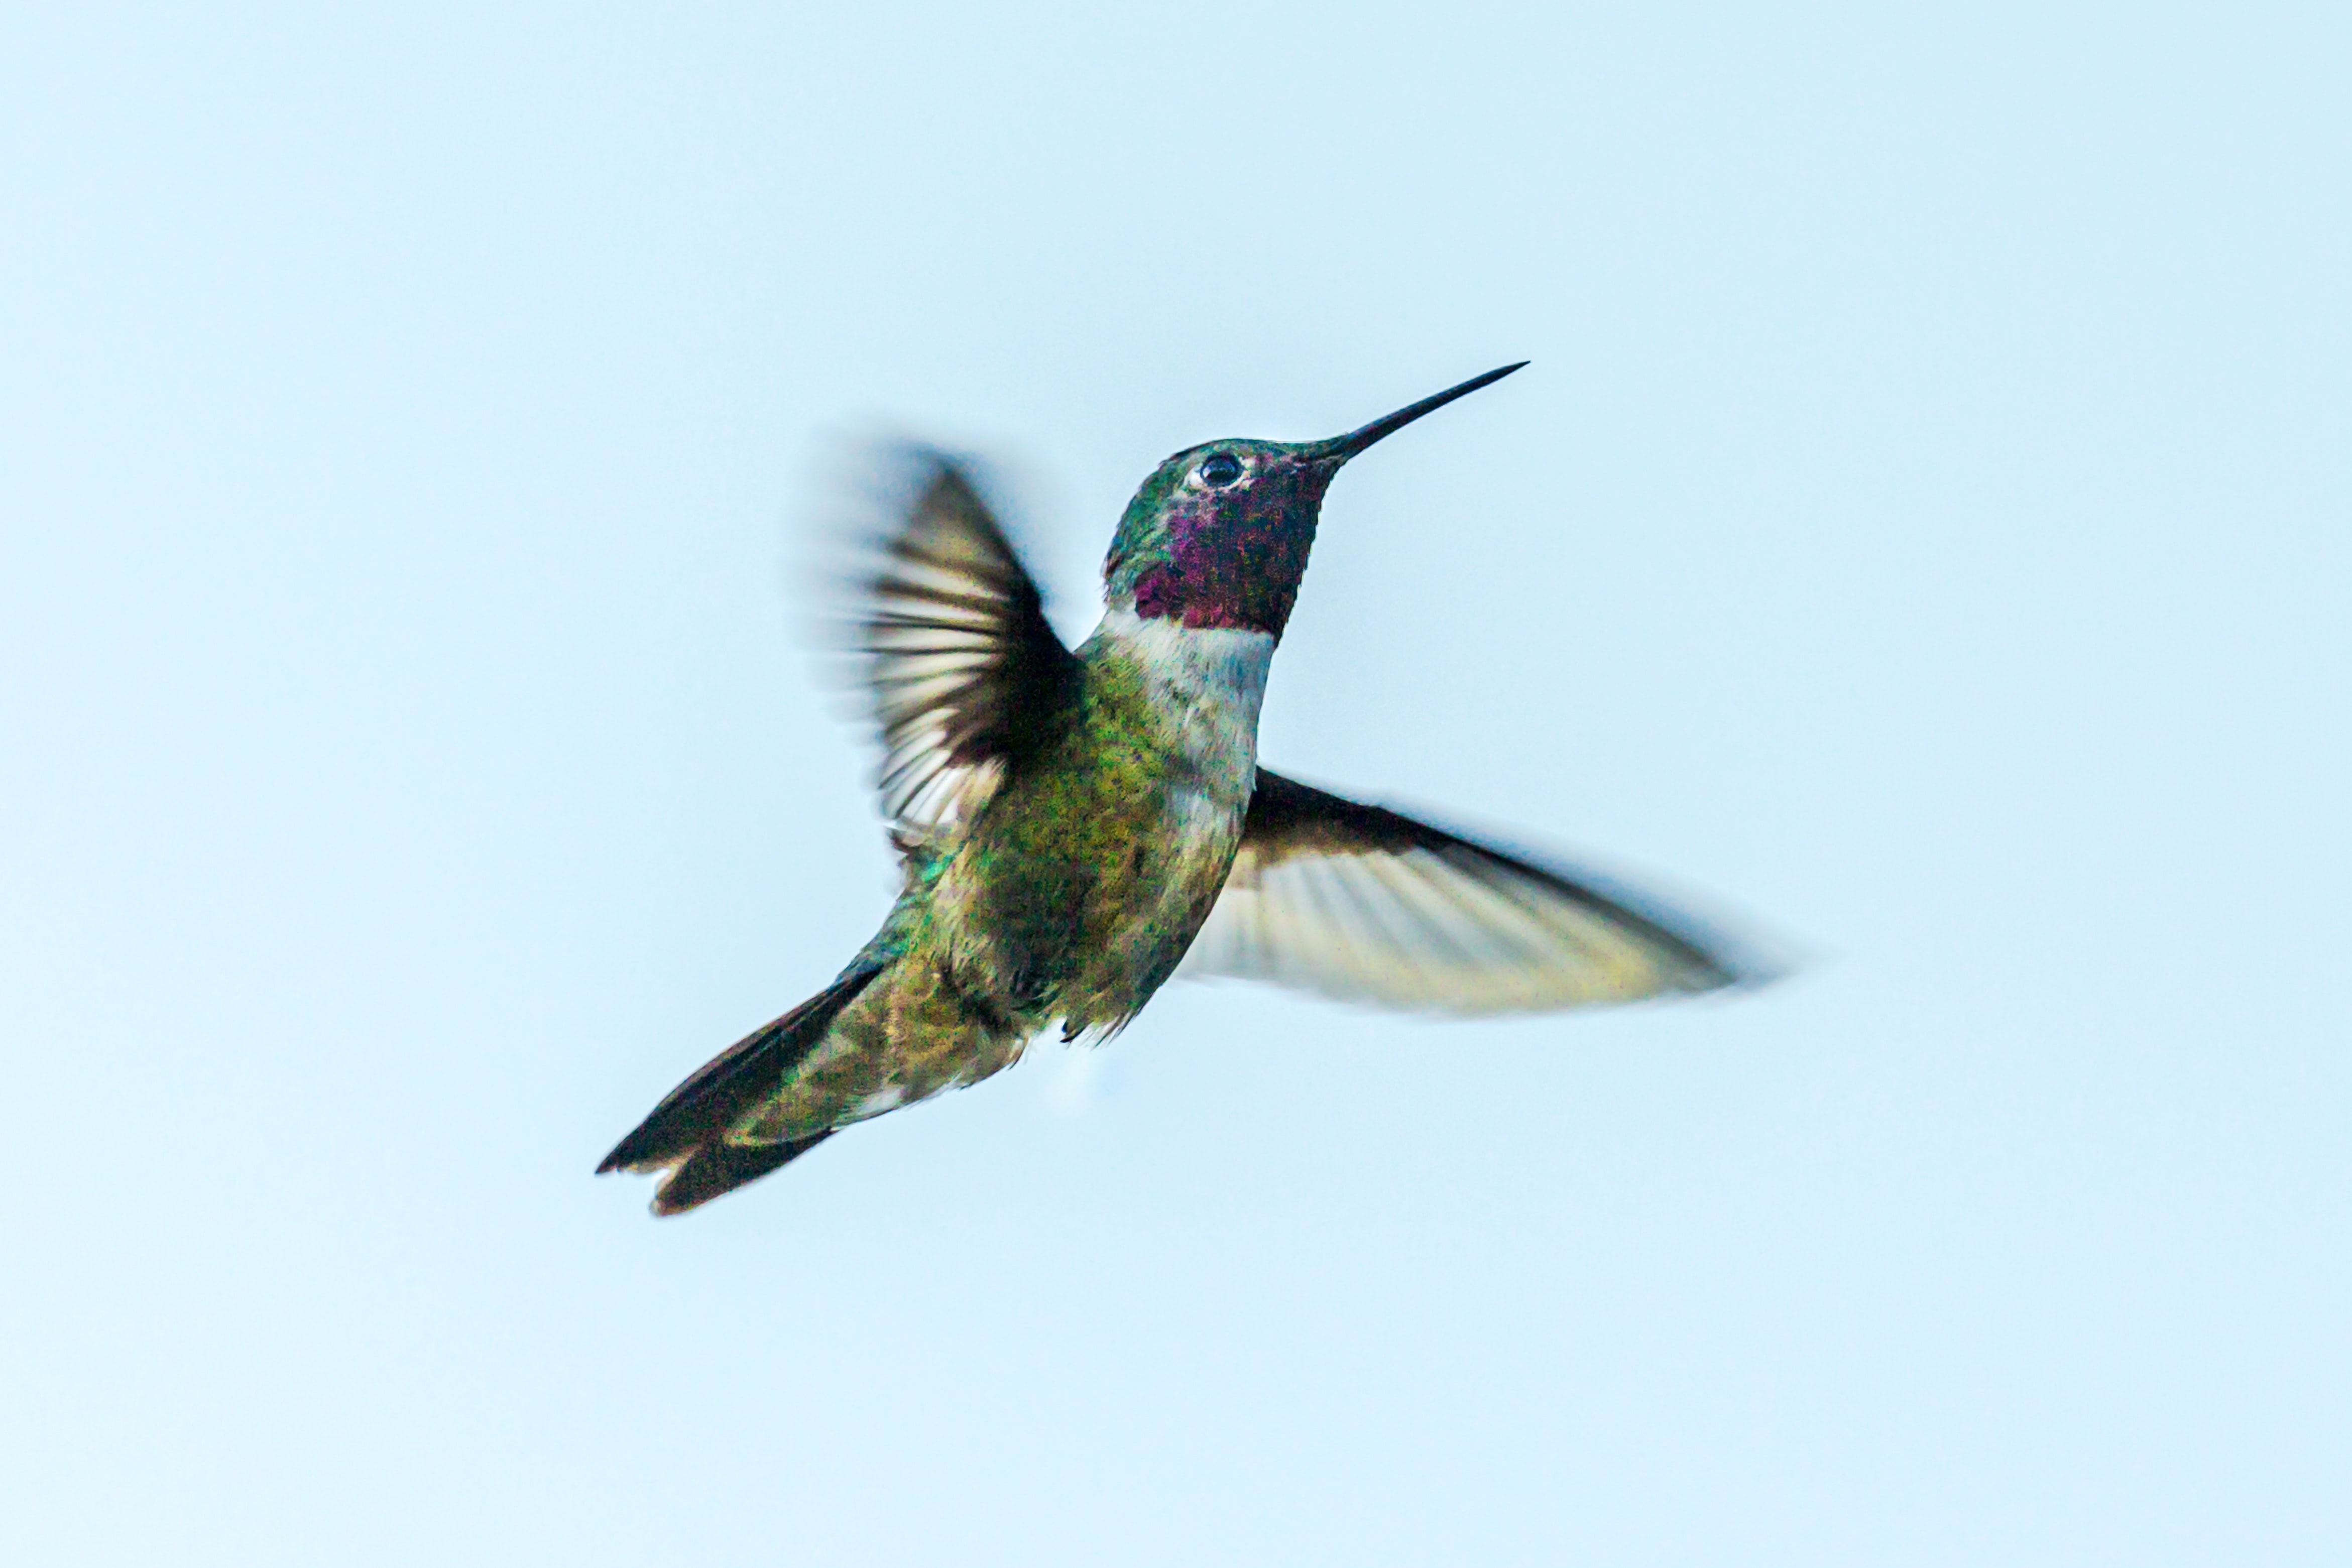 green Hummingbird spreading its wings